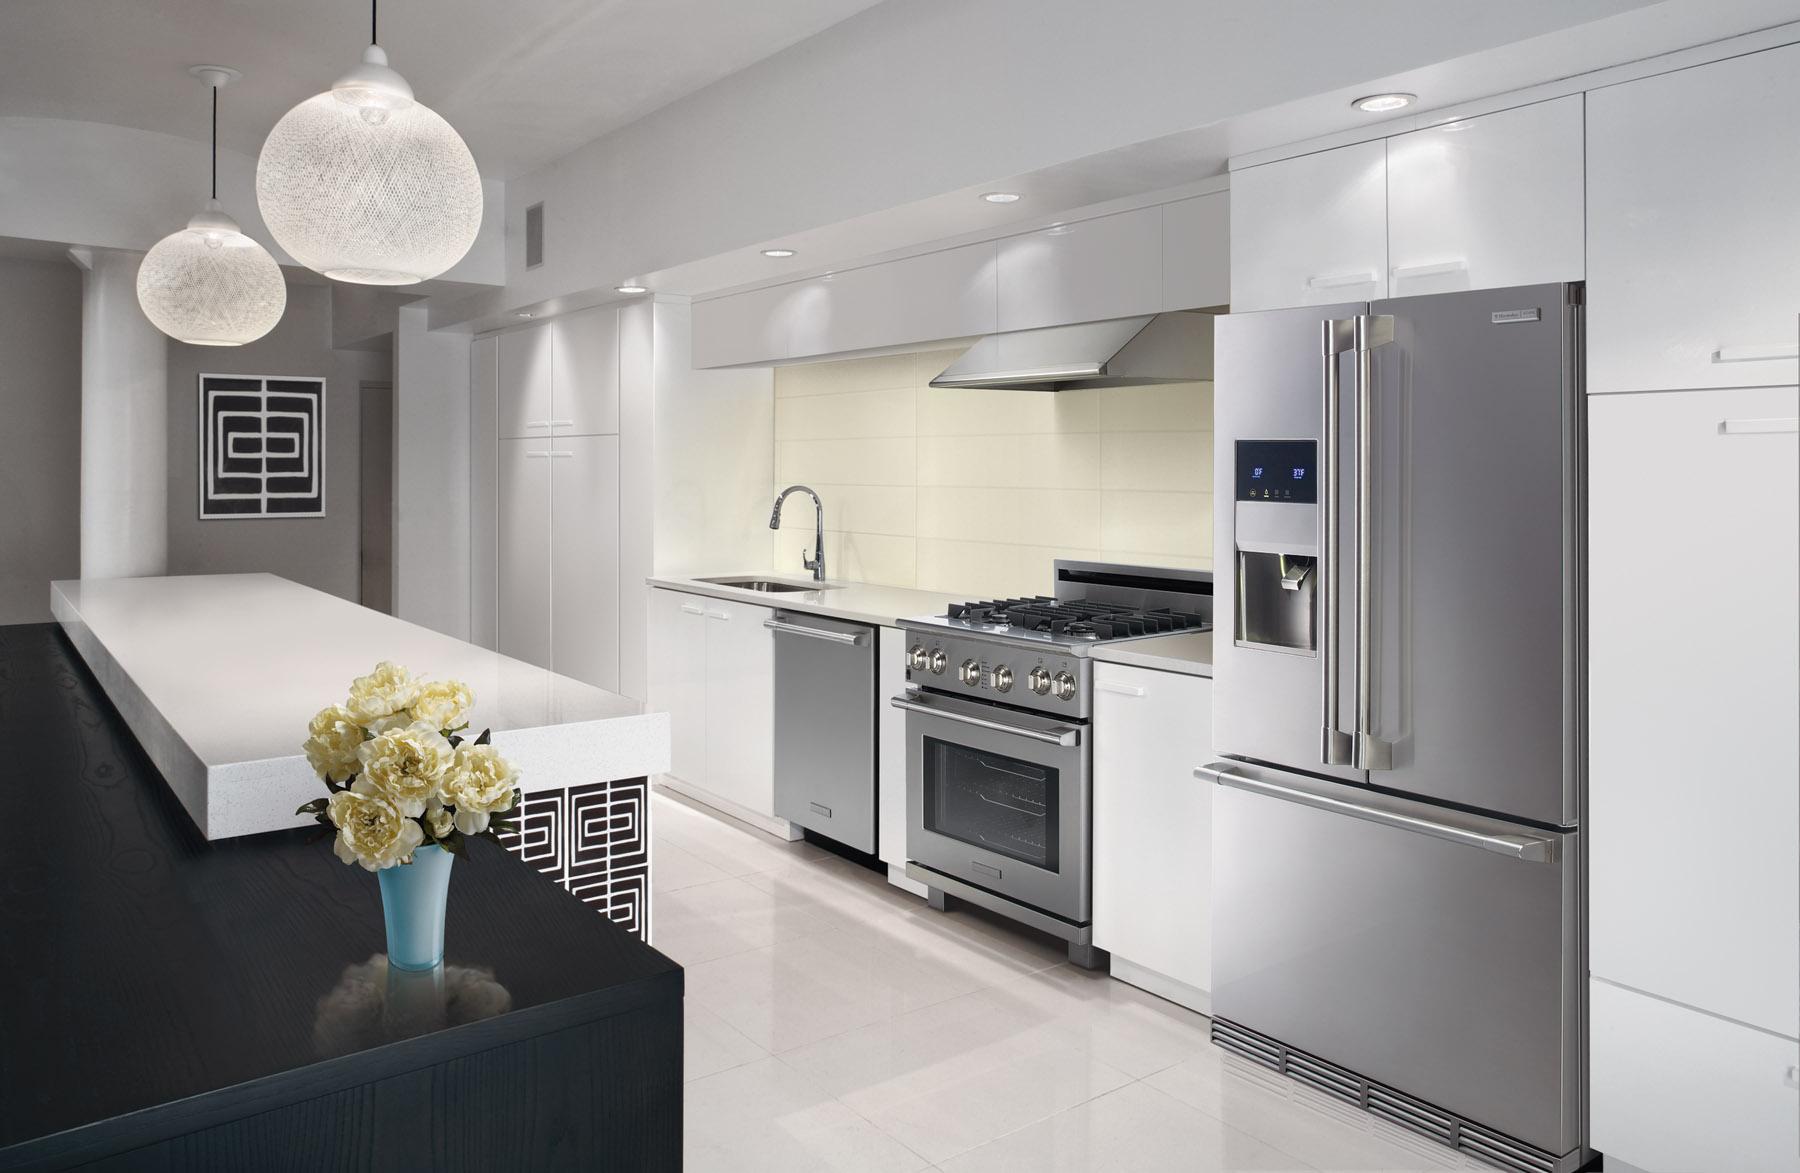 Uncategorized Electrolux Kitchen Appliances icon shop for electrolux icon